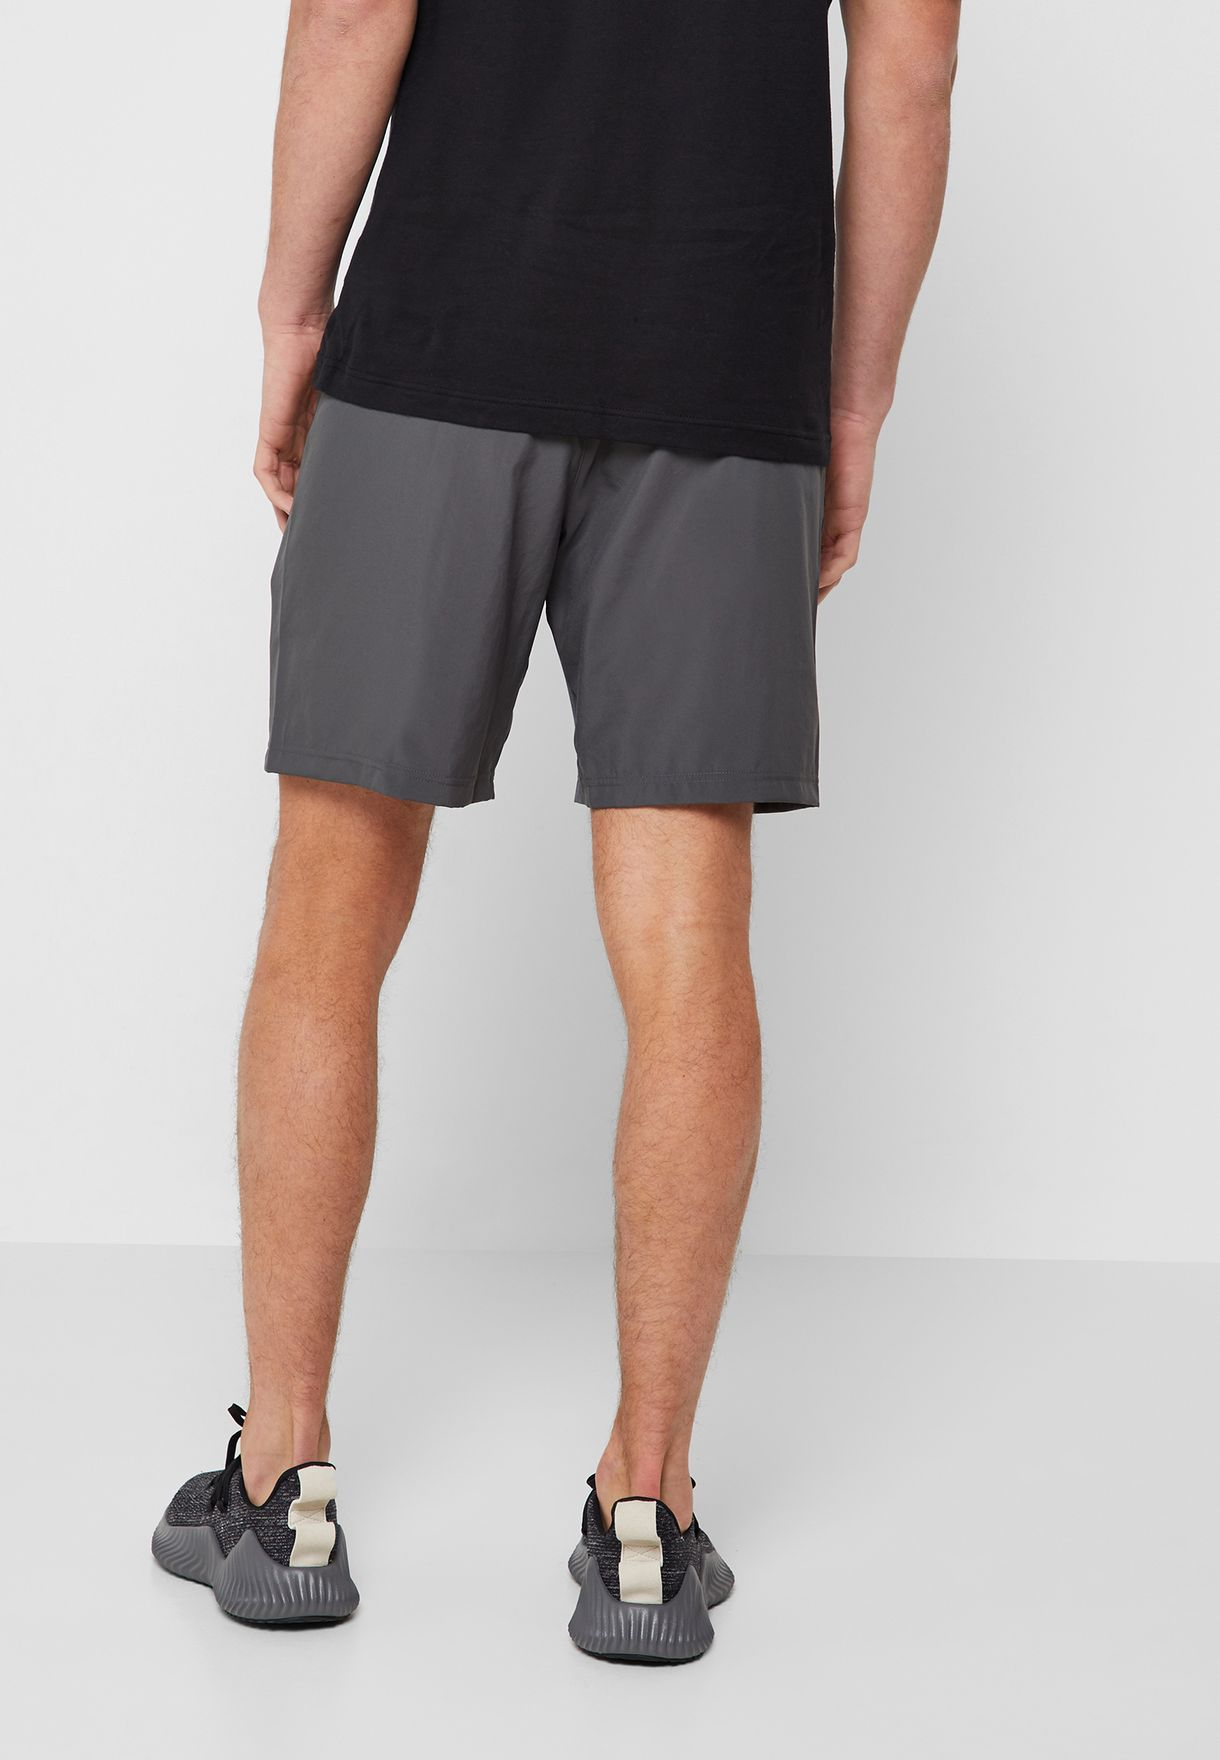 D2M Cool Shorts